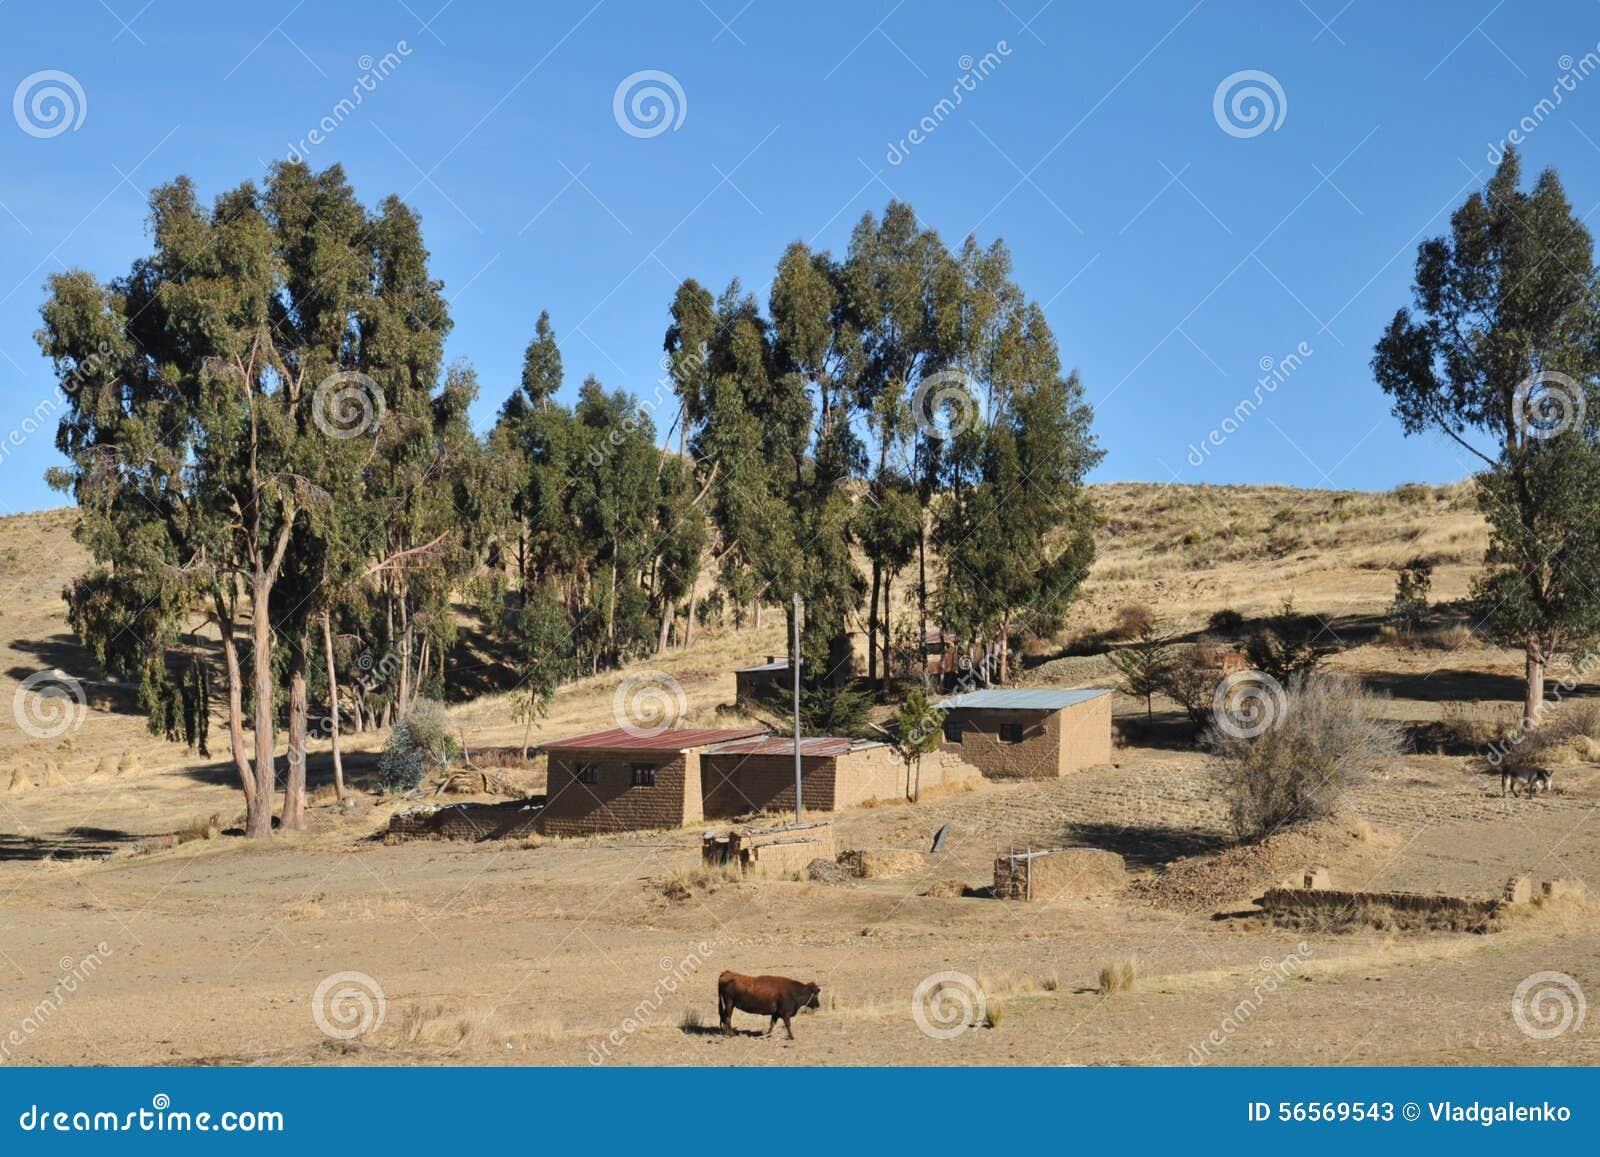 Download Βολιβιανό χωριό στις ακτές της λίμνης Titicaca Στοκ Εικόνα - εικόνα από φύση, boleyn: 56569543